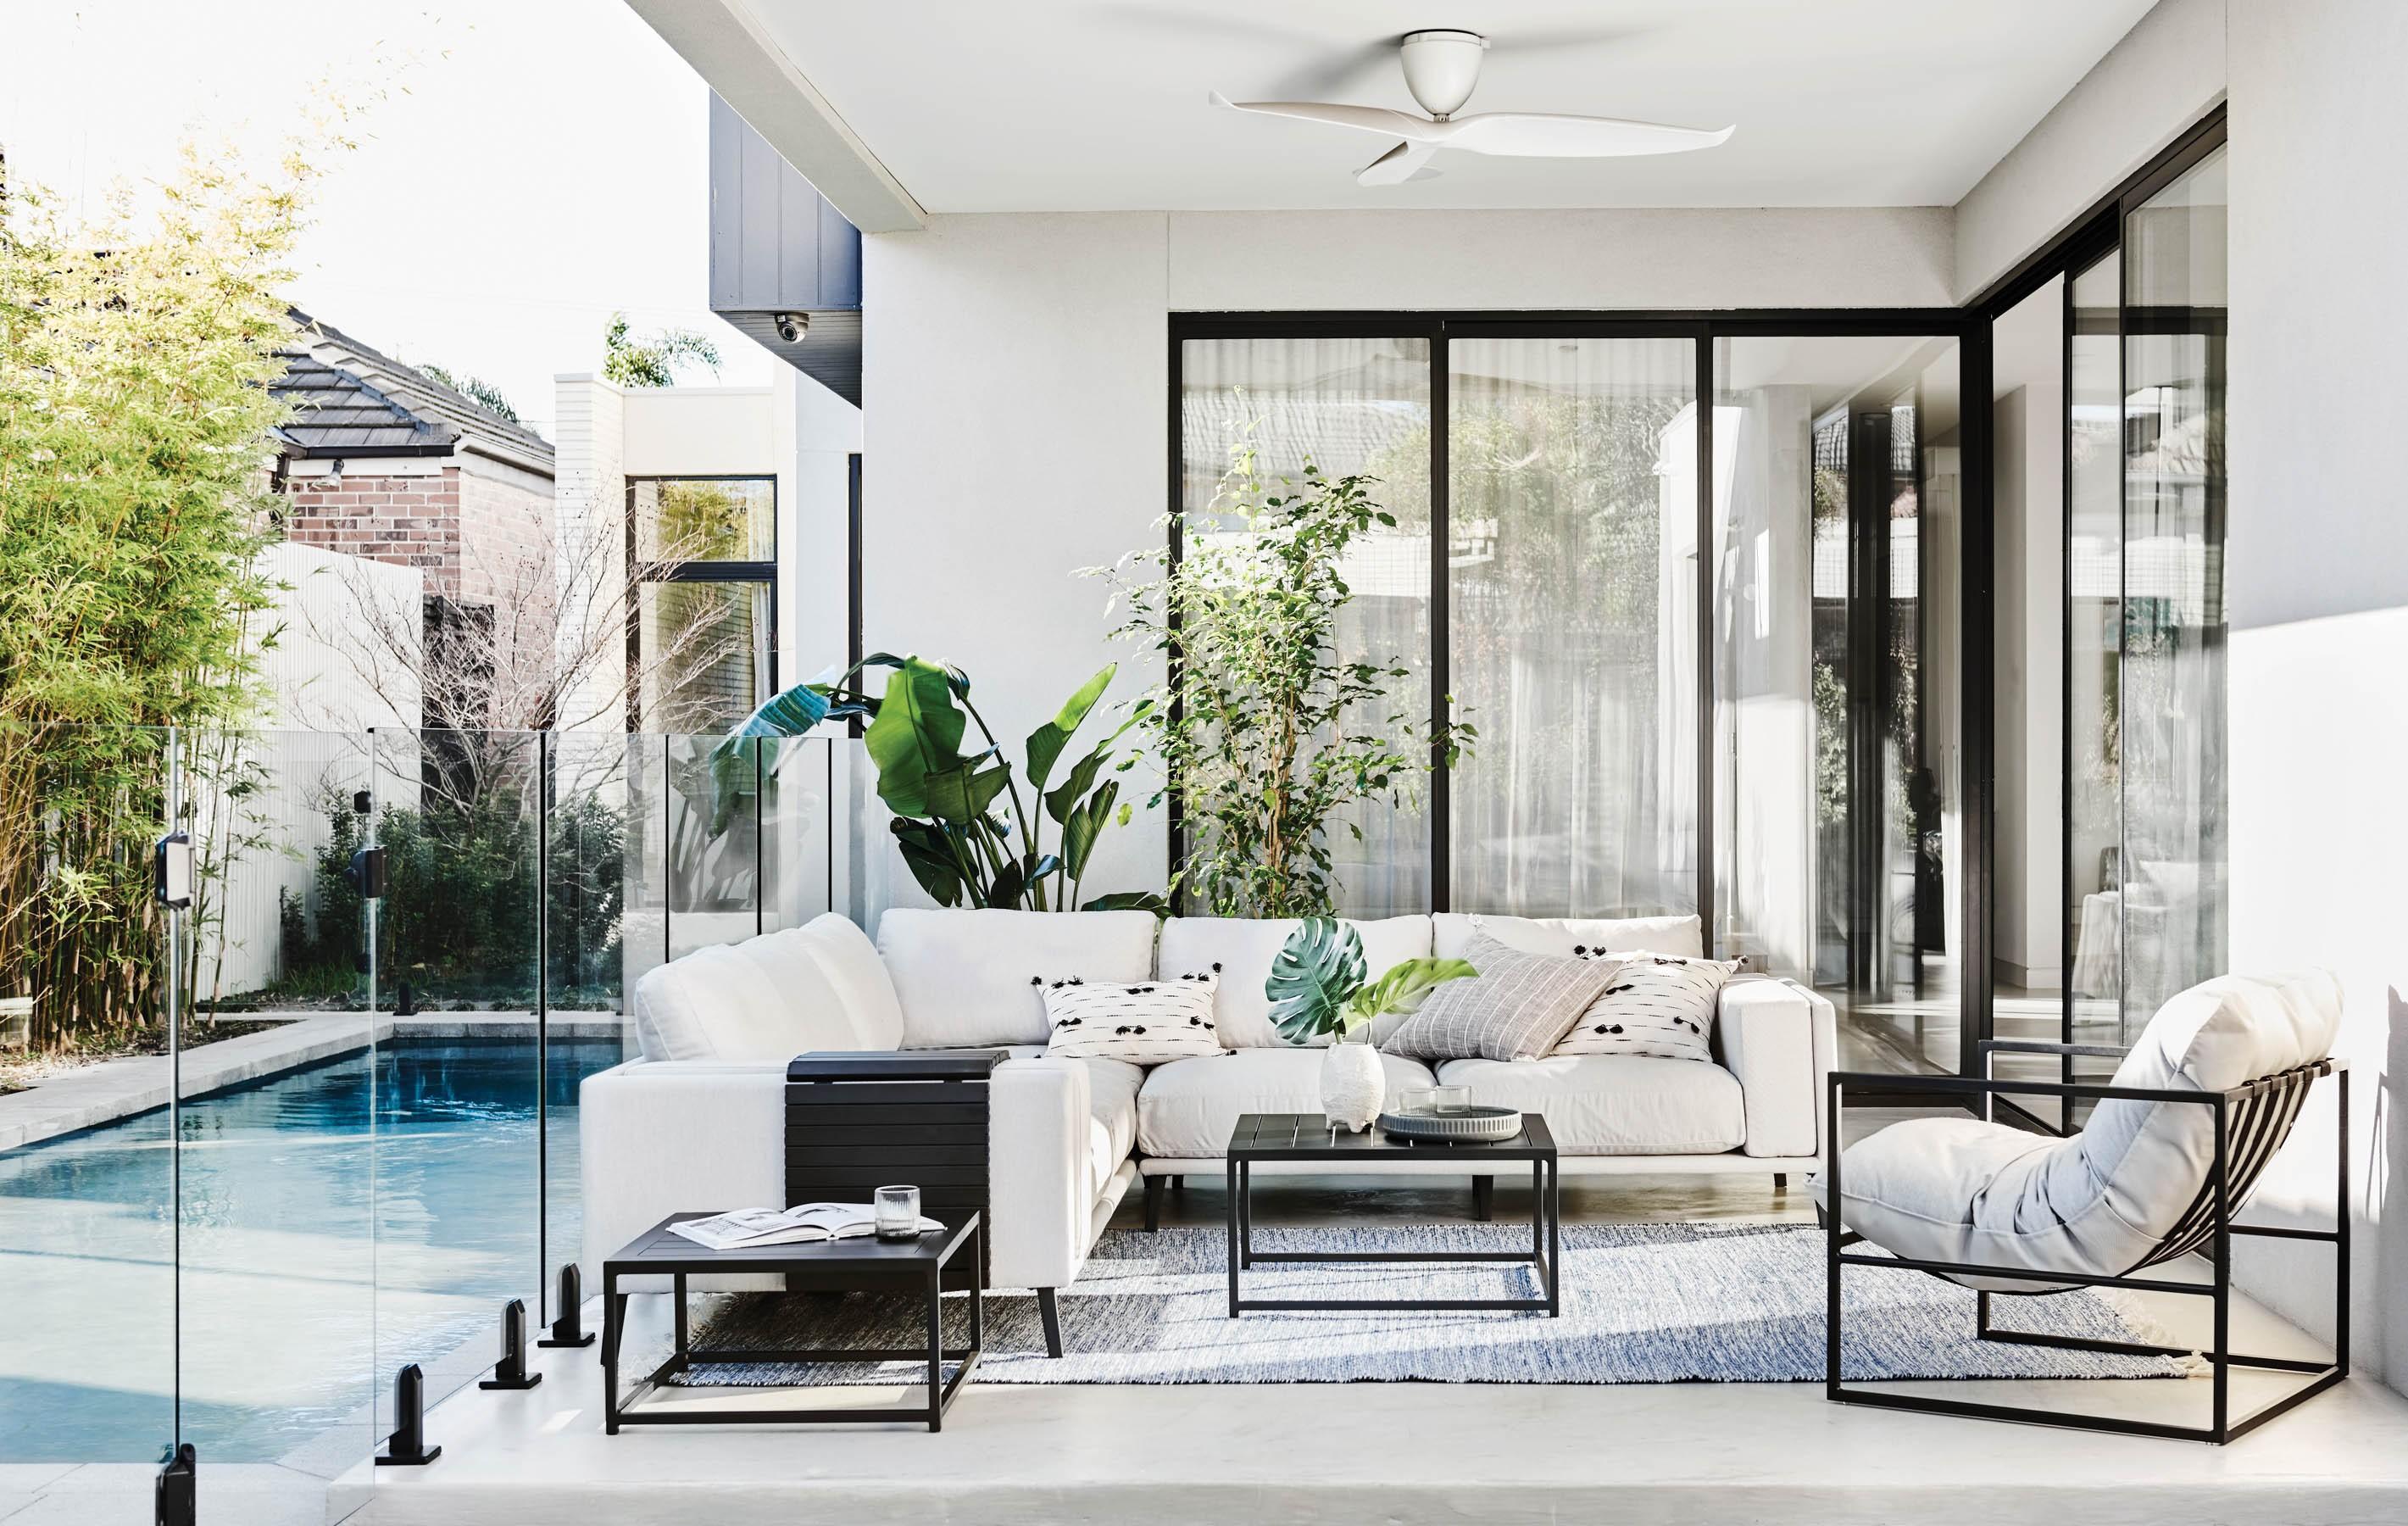 Furniture Gallery Sofas aruba-platform-chaise-02